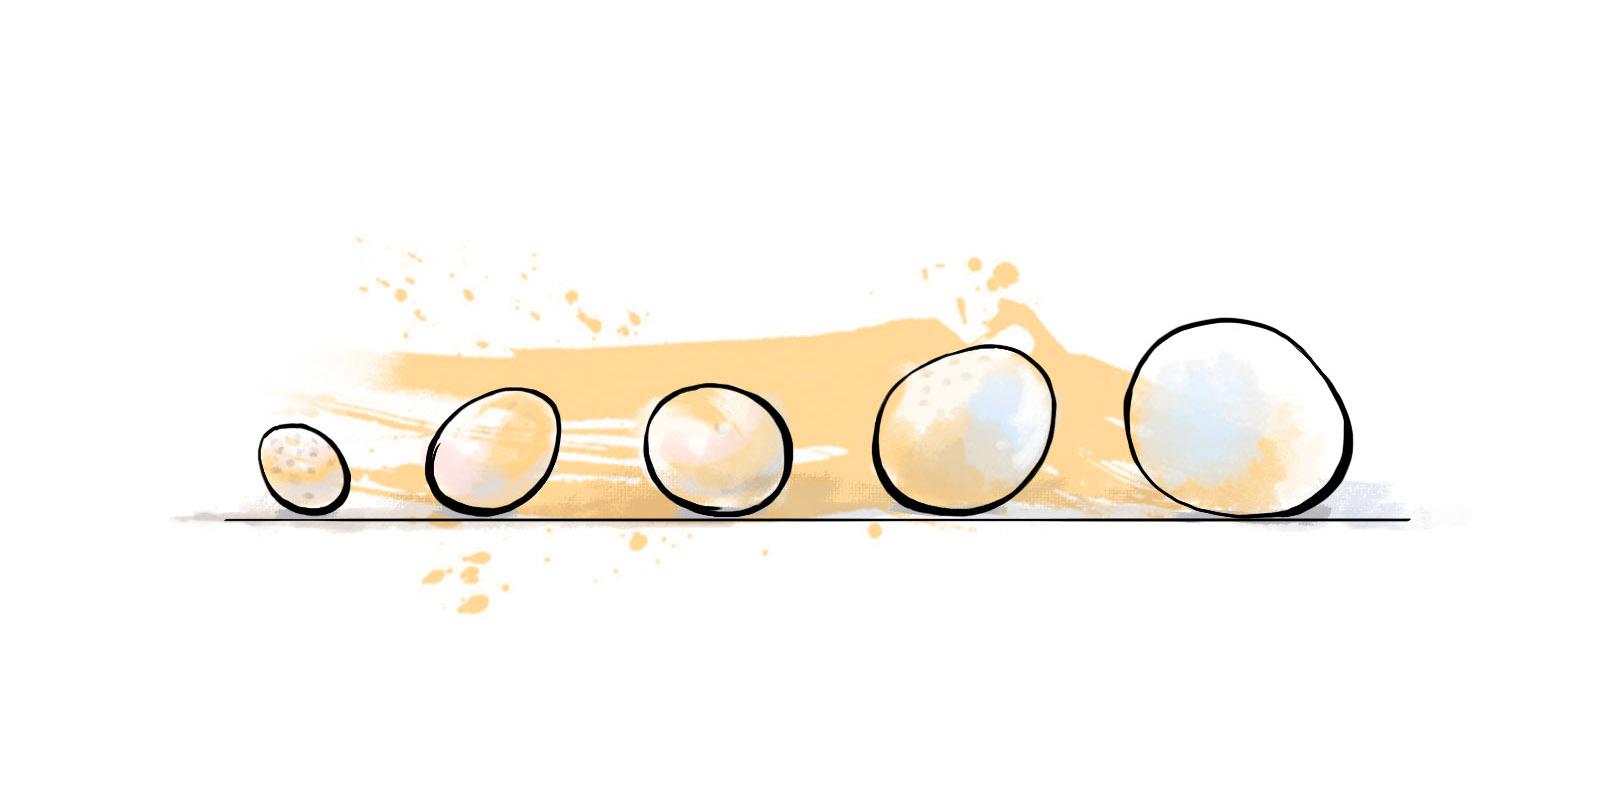 Ранг и размер яиц